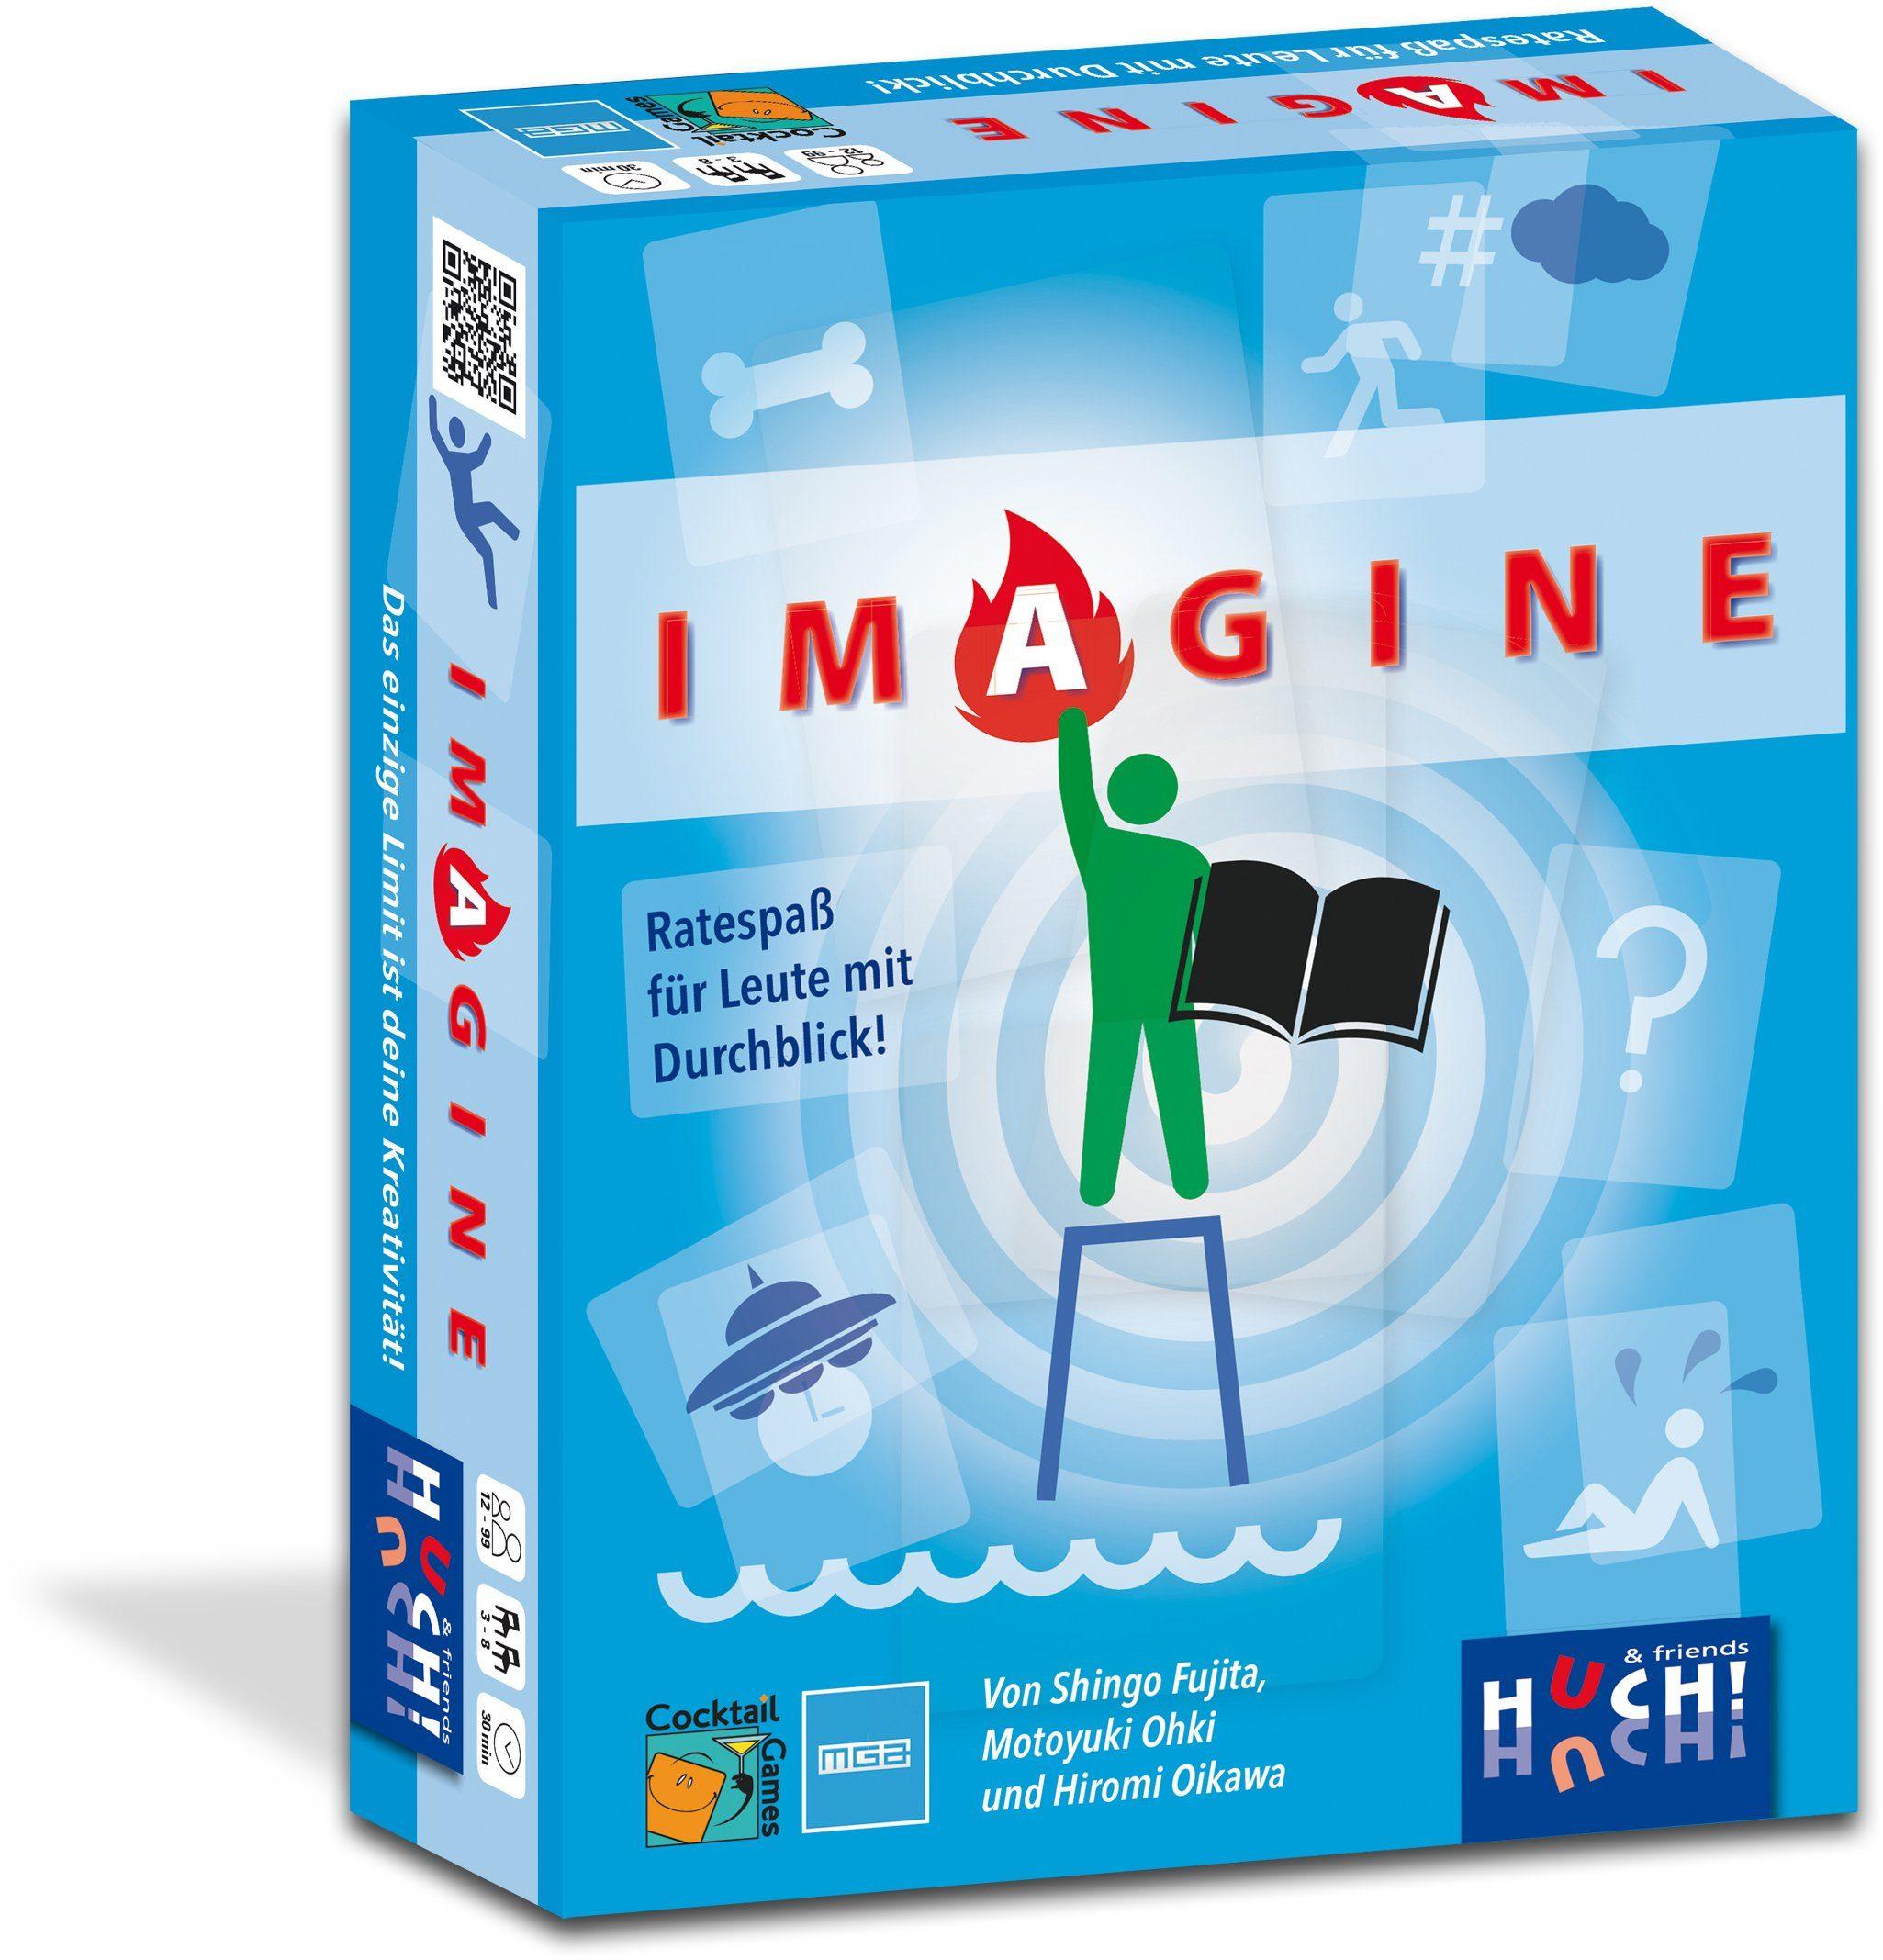 Huch! & friends Ratespiel, »Imagine«